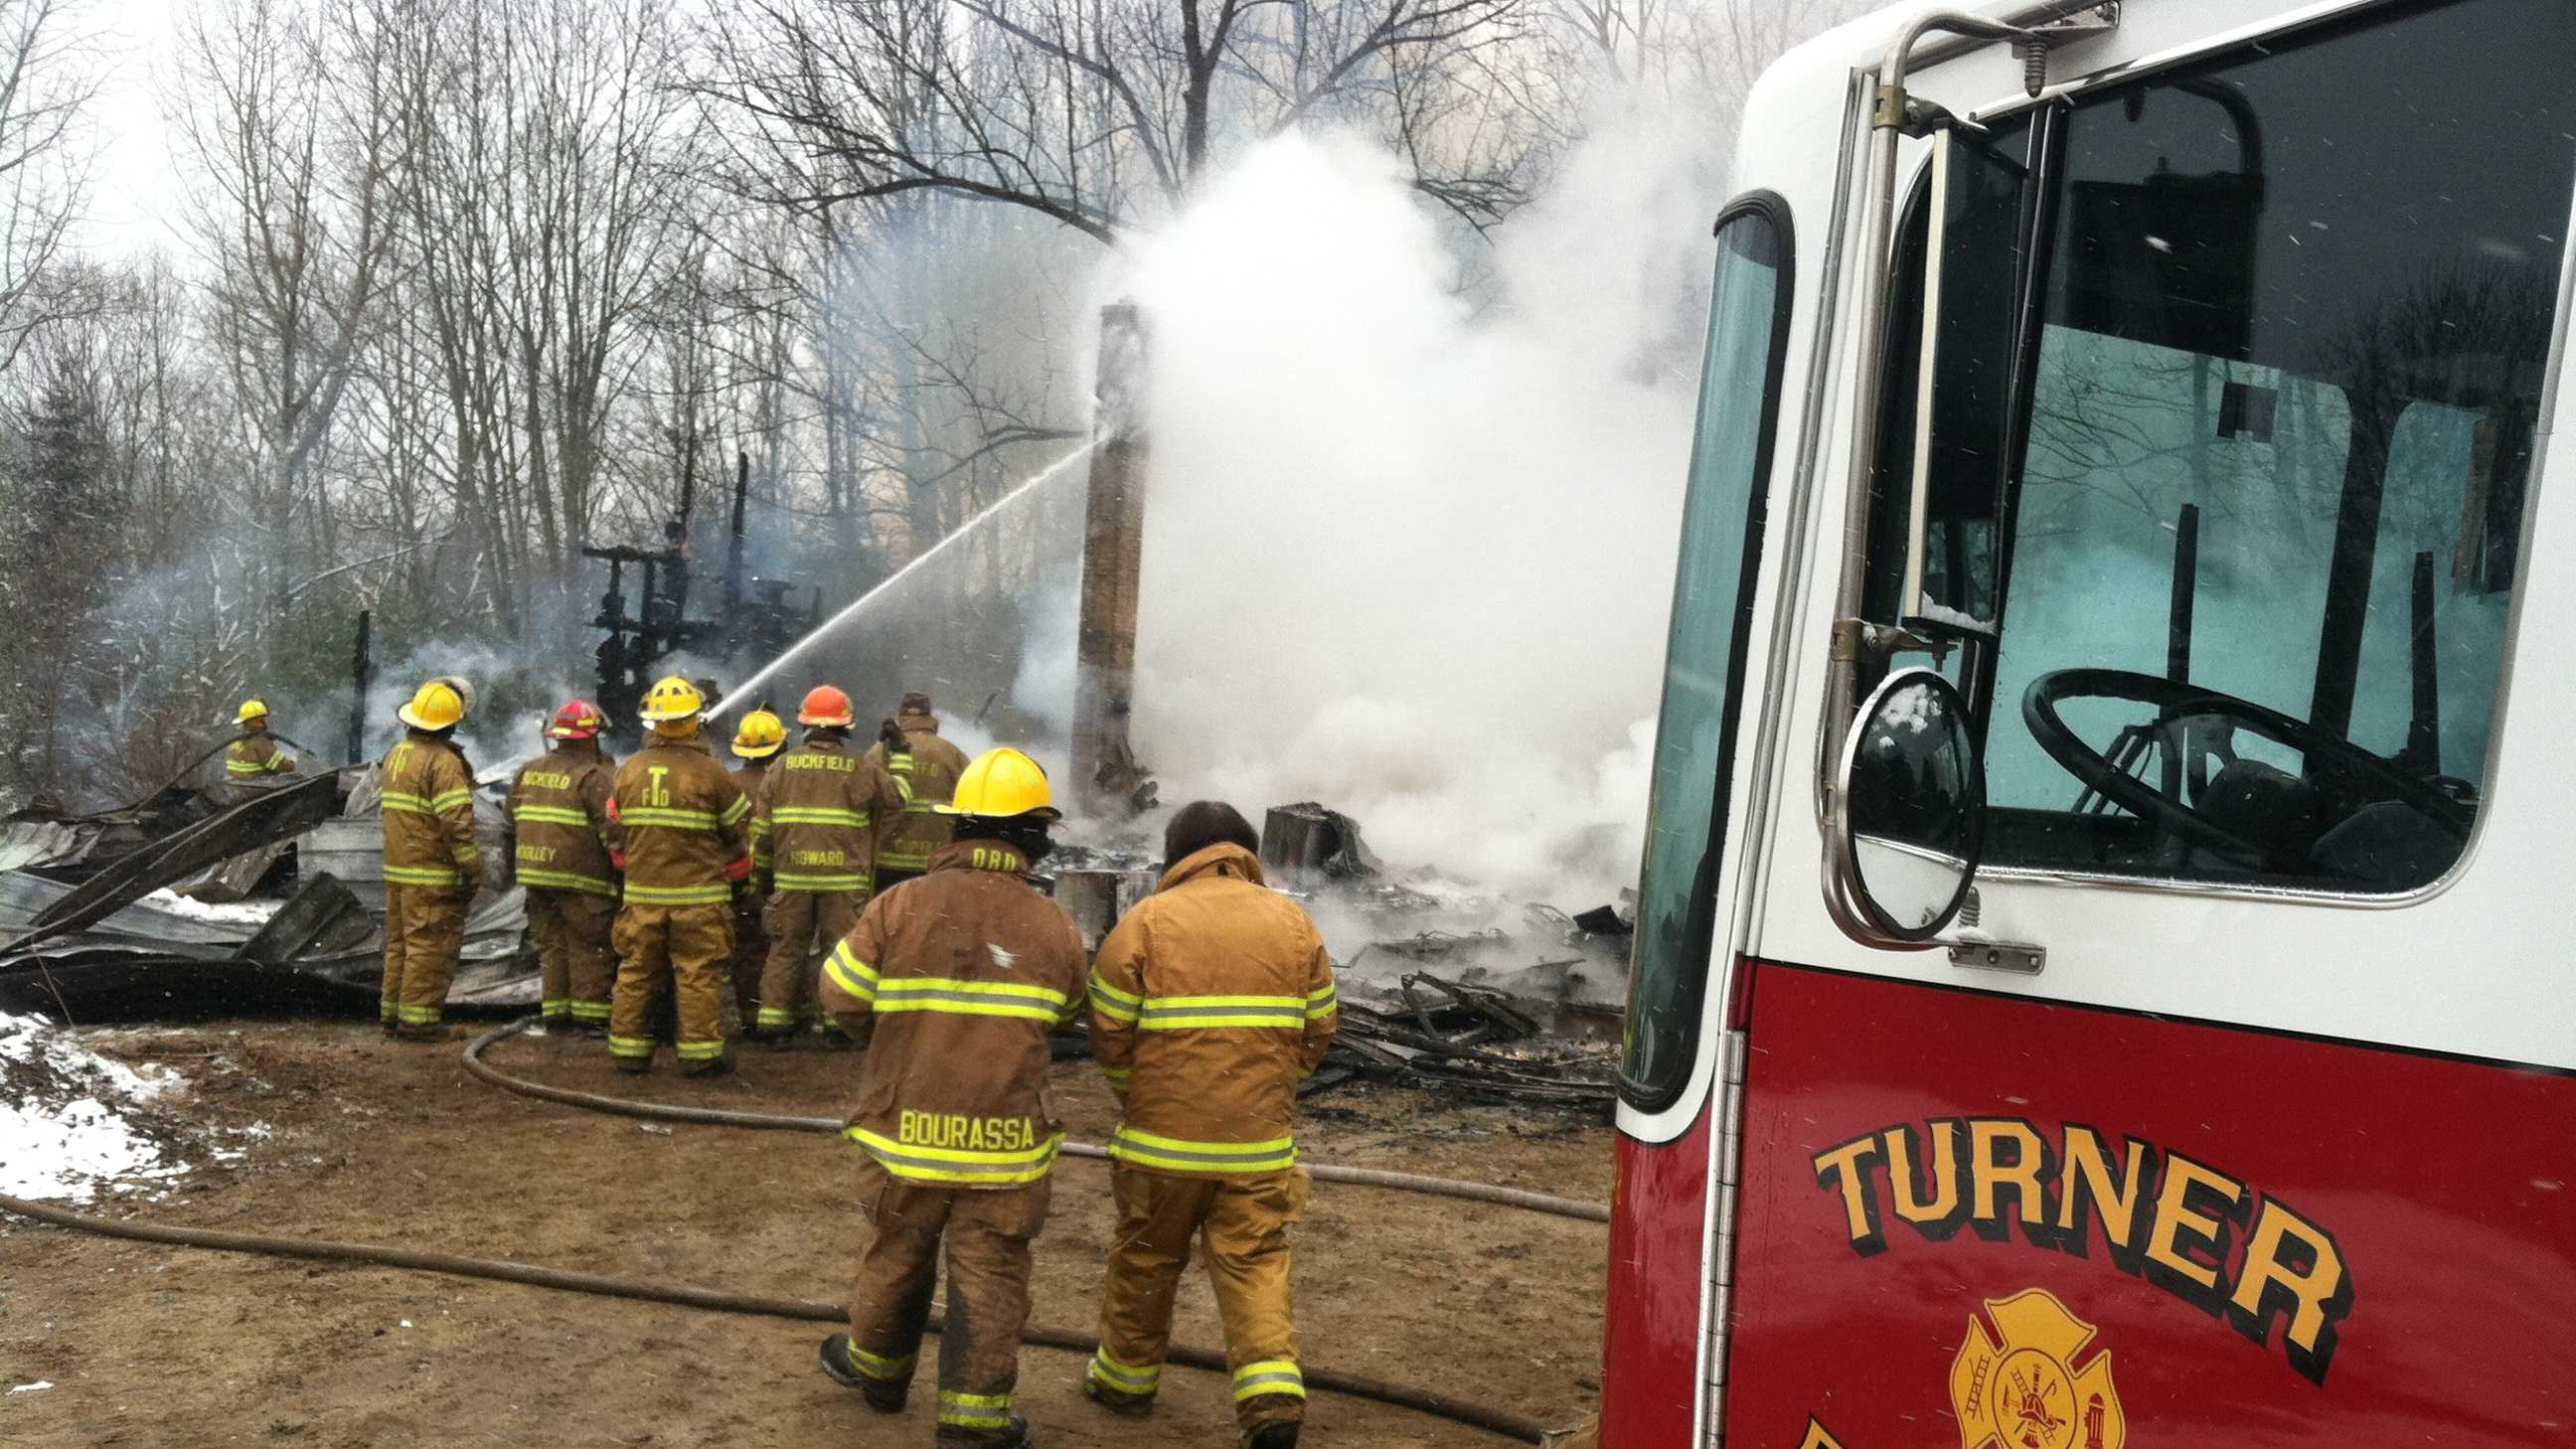 Turner Fire